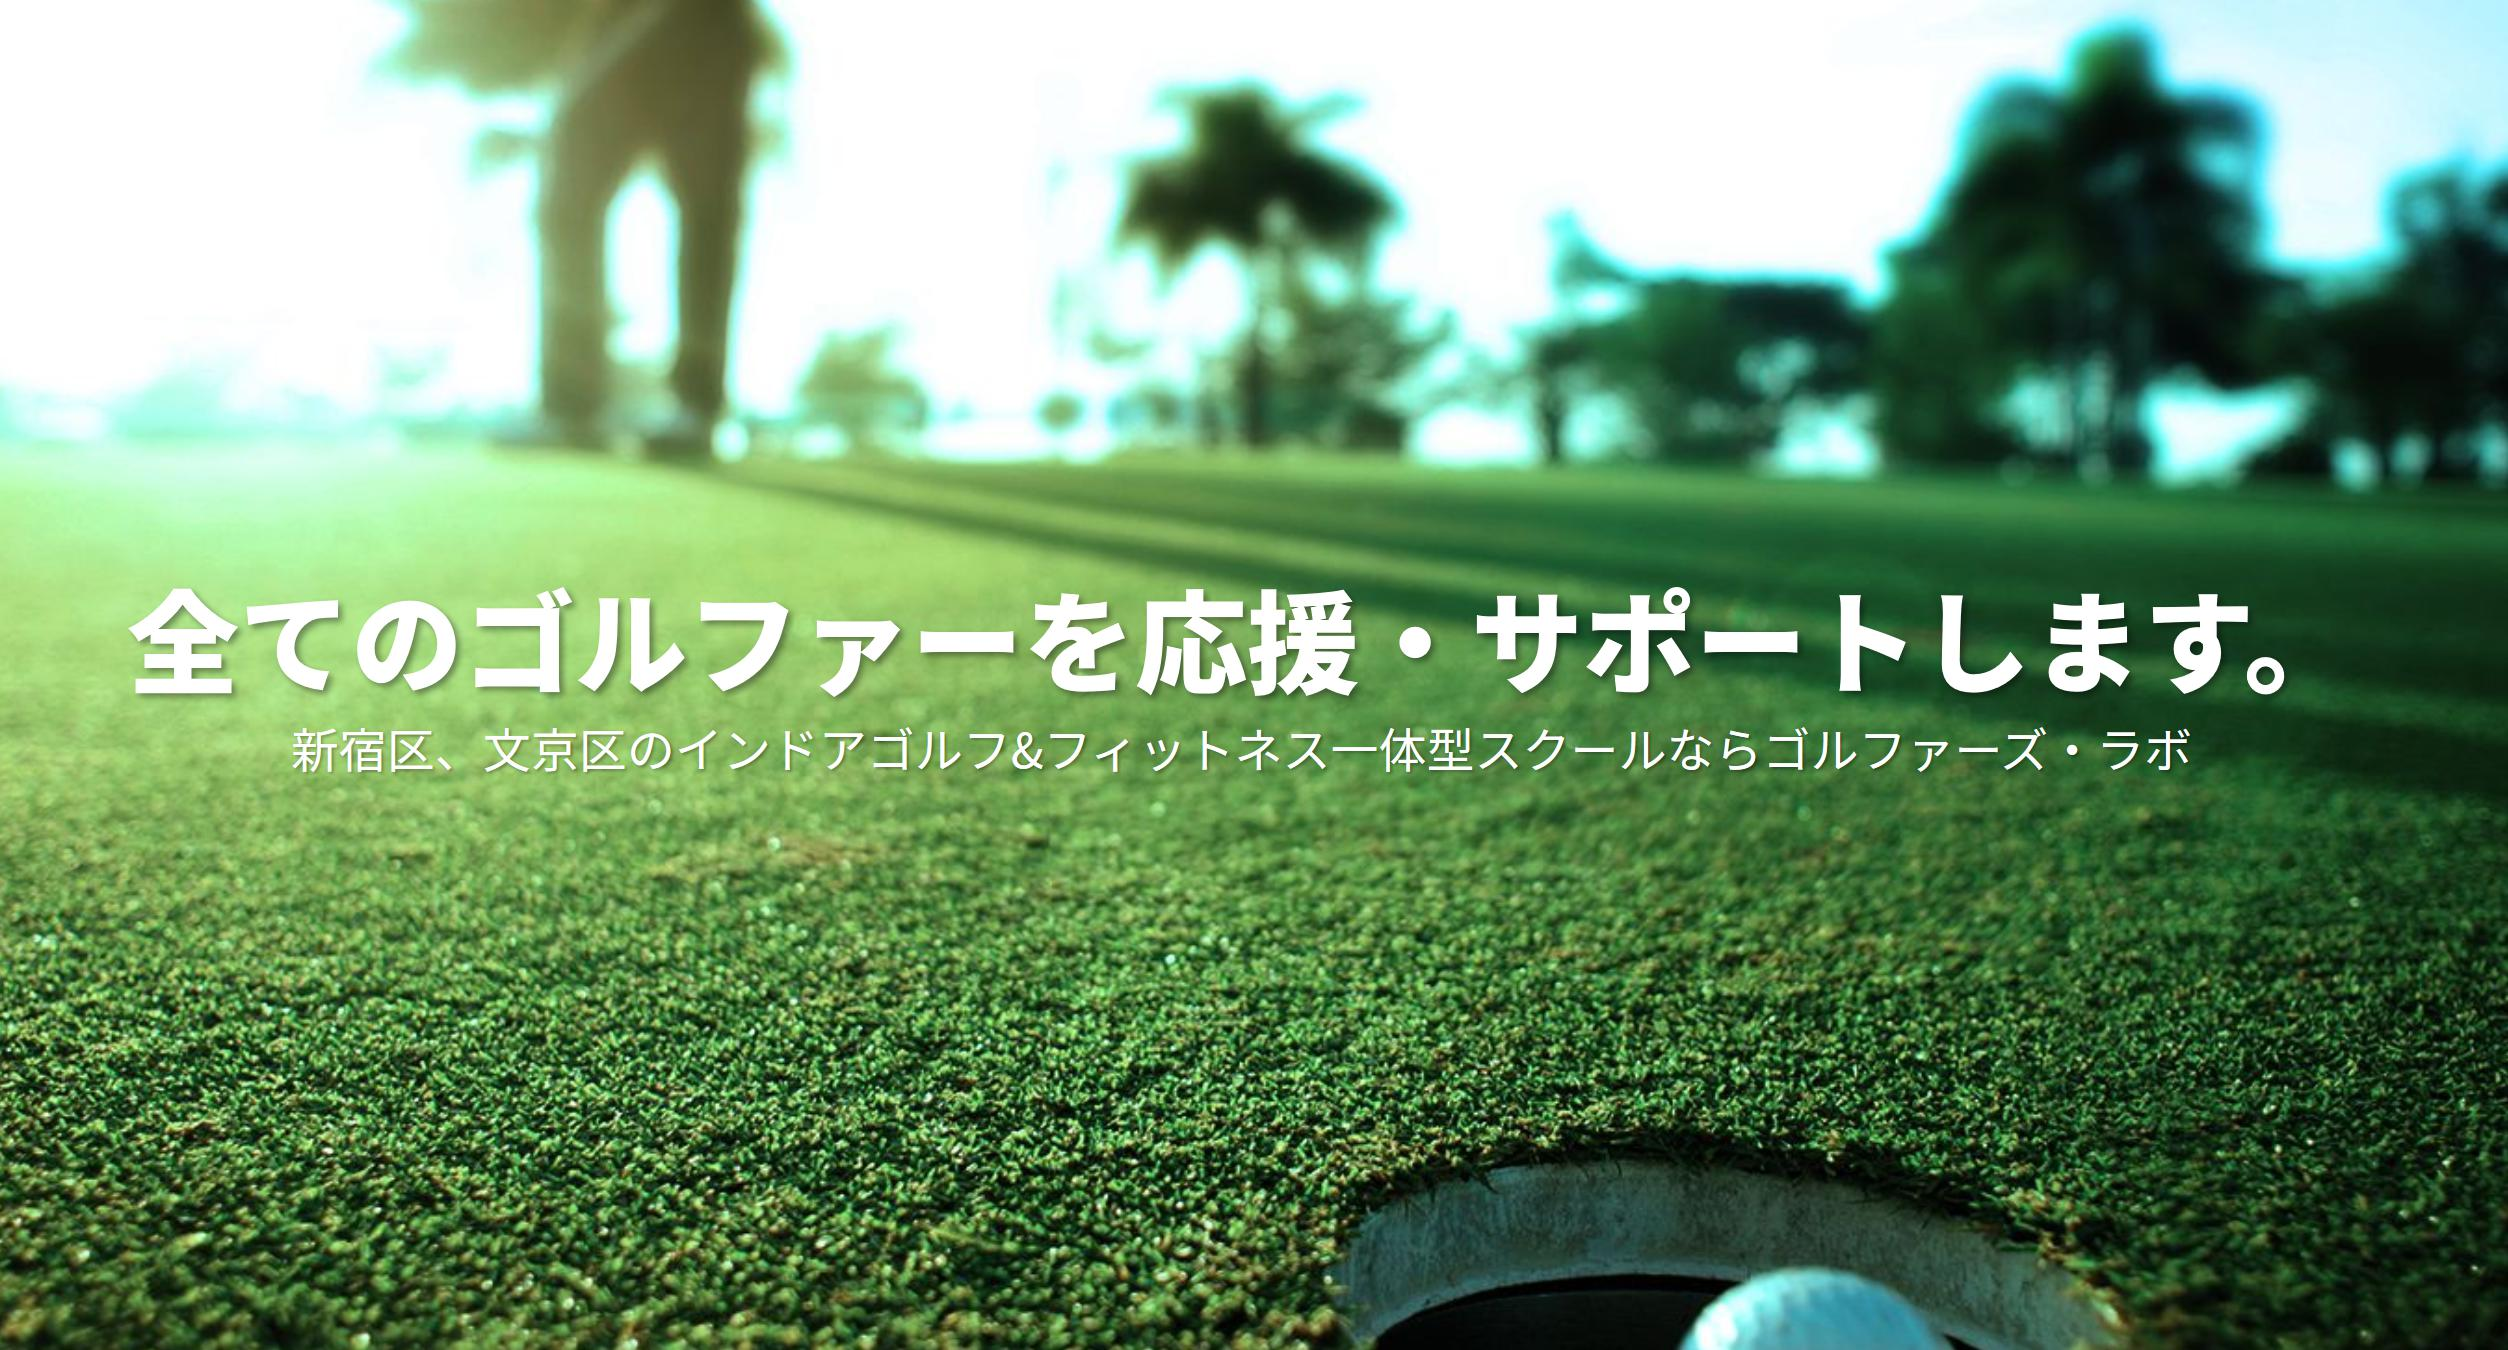 golfers-labo.com